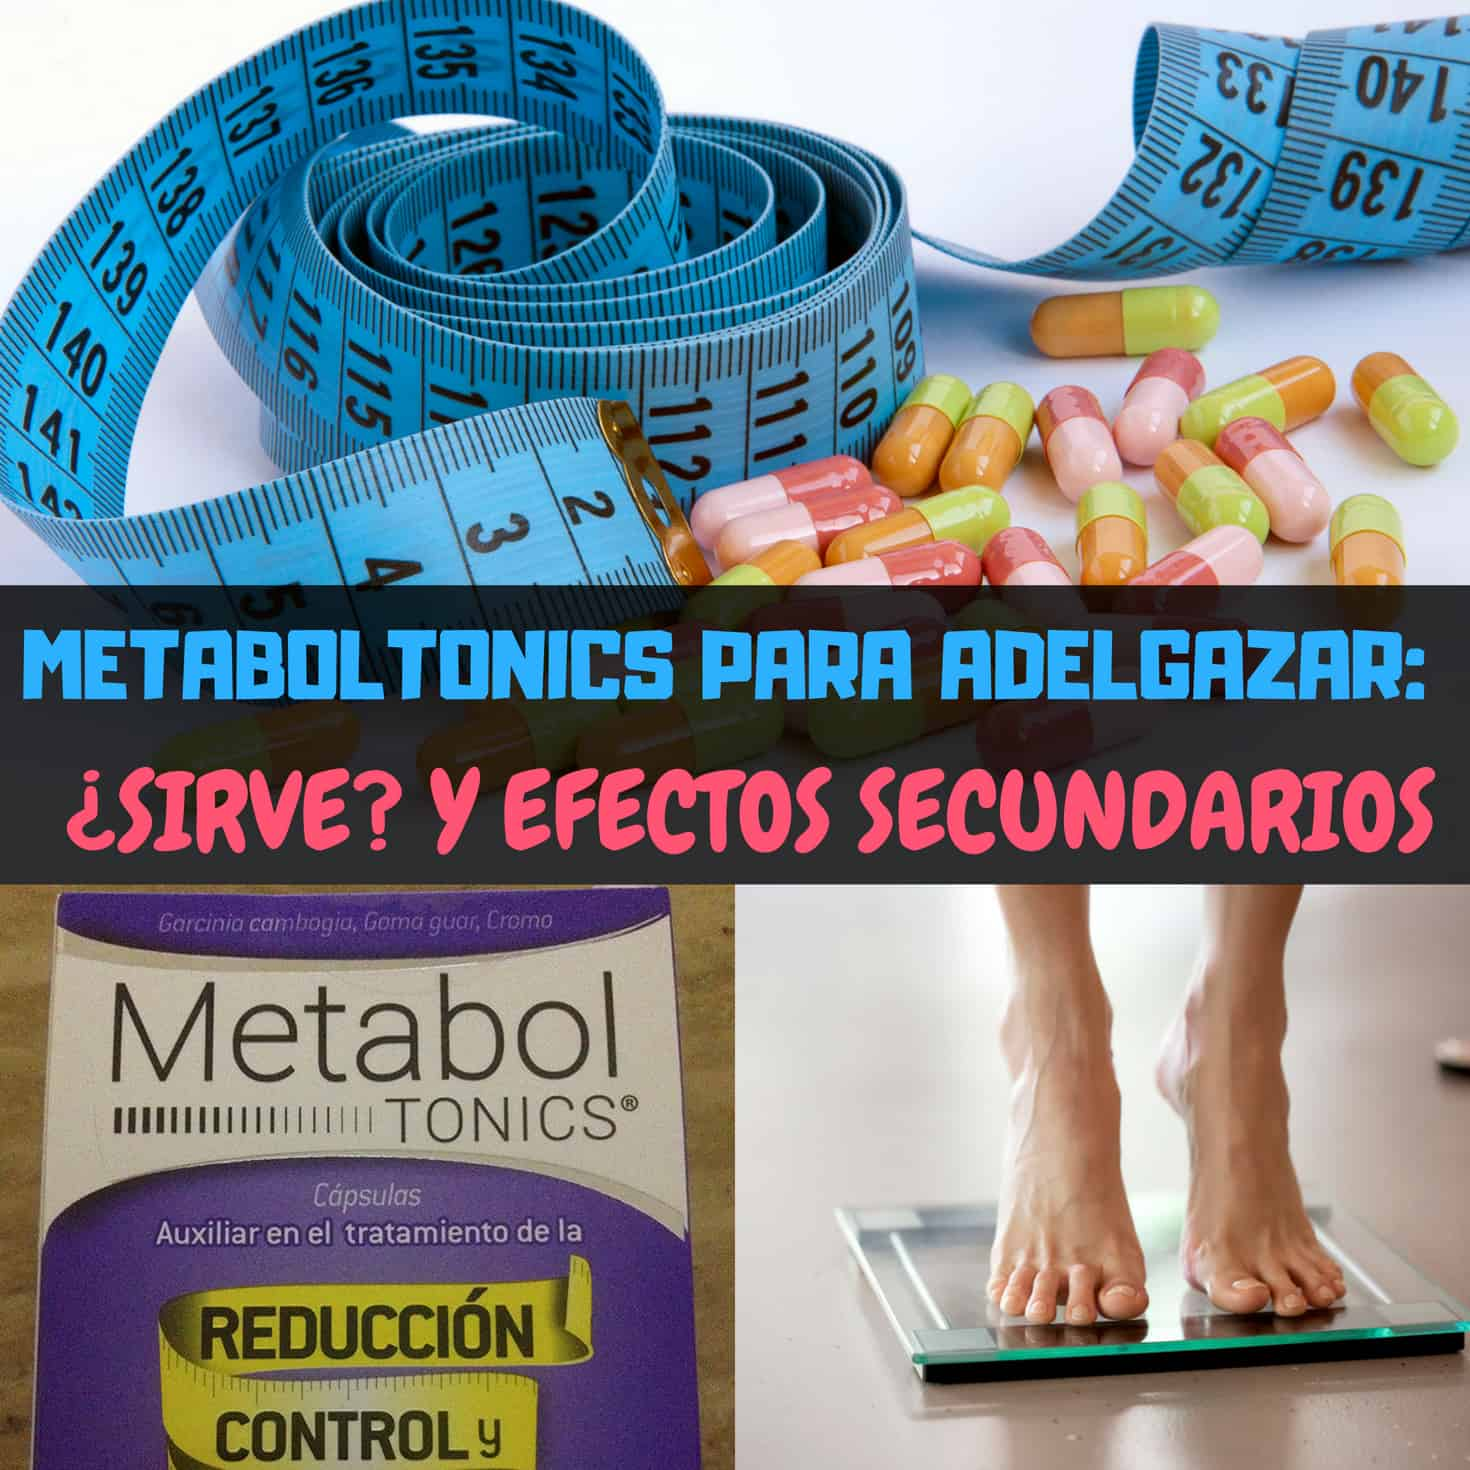 Metaboltonics sirve para bajar de peso